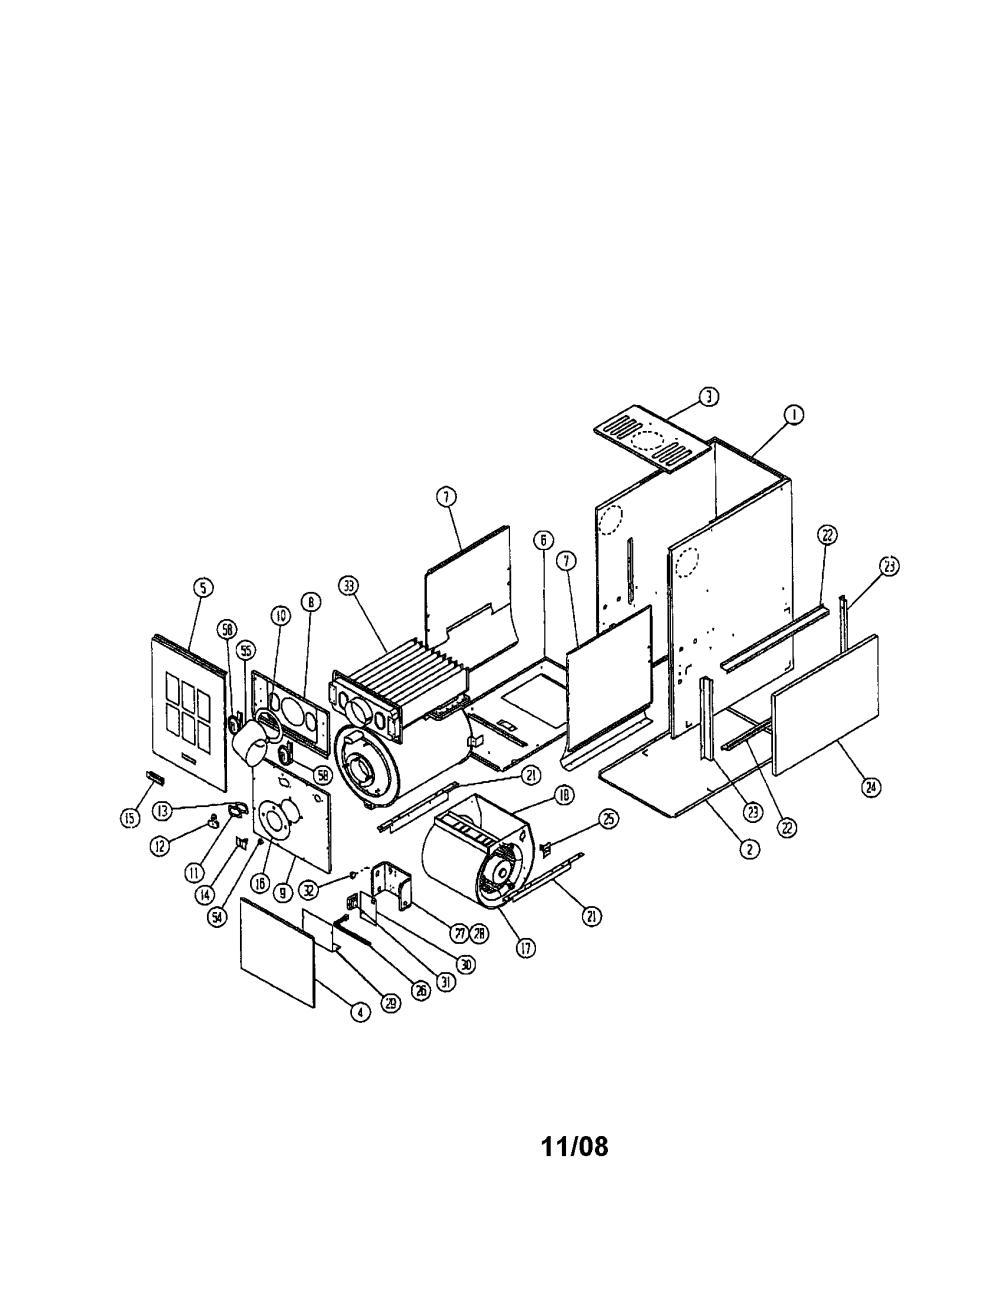 medium resolution of 1998 ford taurus parts diagram wiring schematic